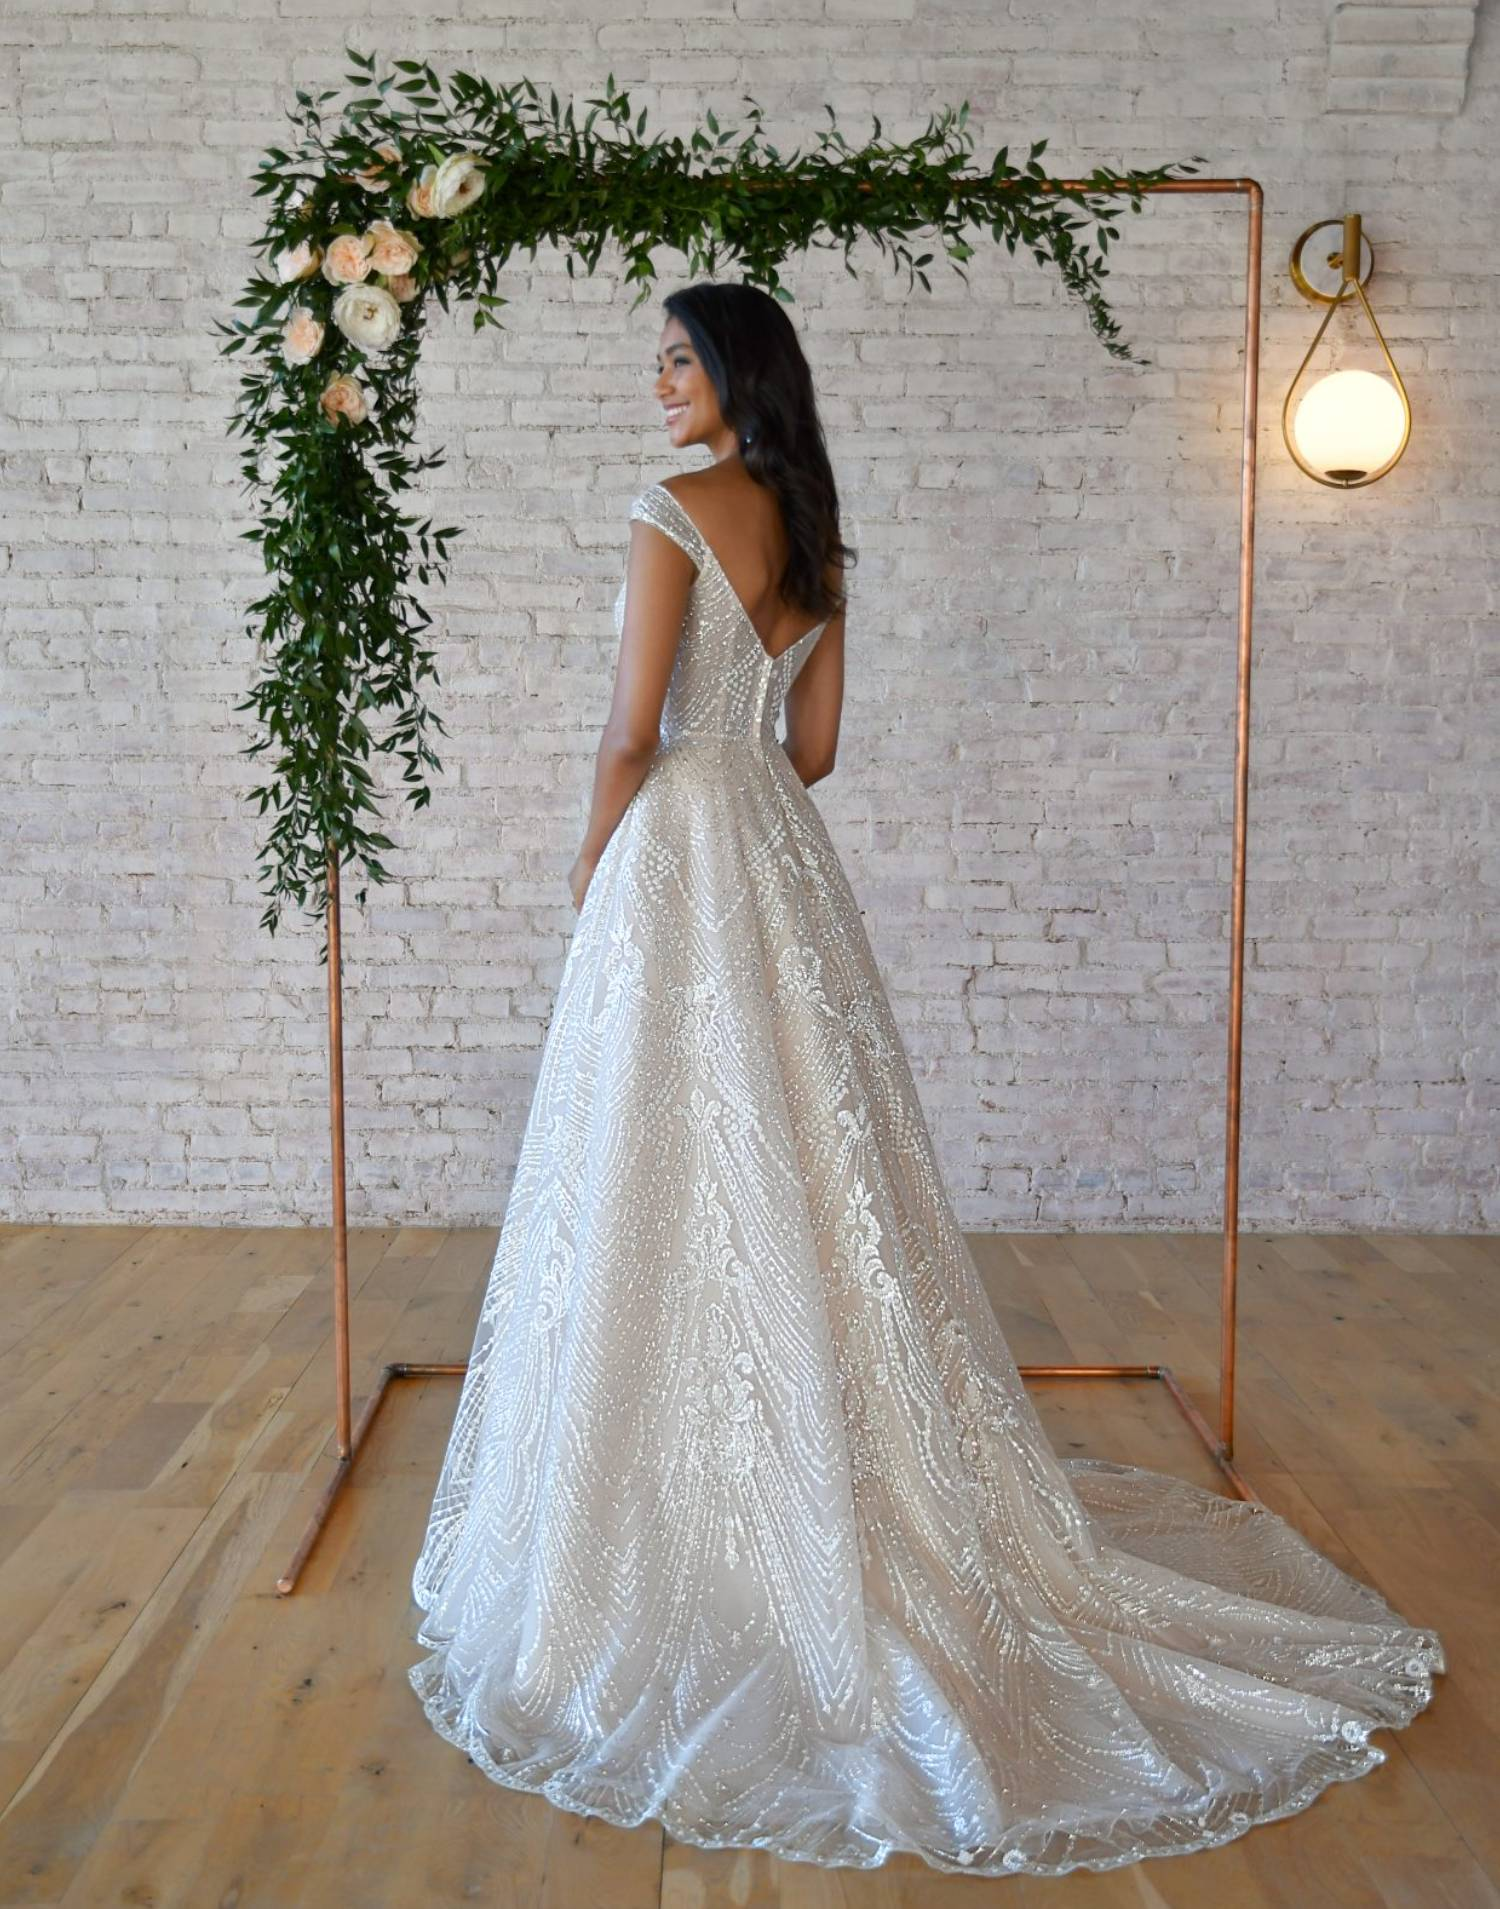 7336-wedding-dress-Stella-York-front-view-ivory-min